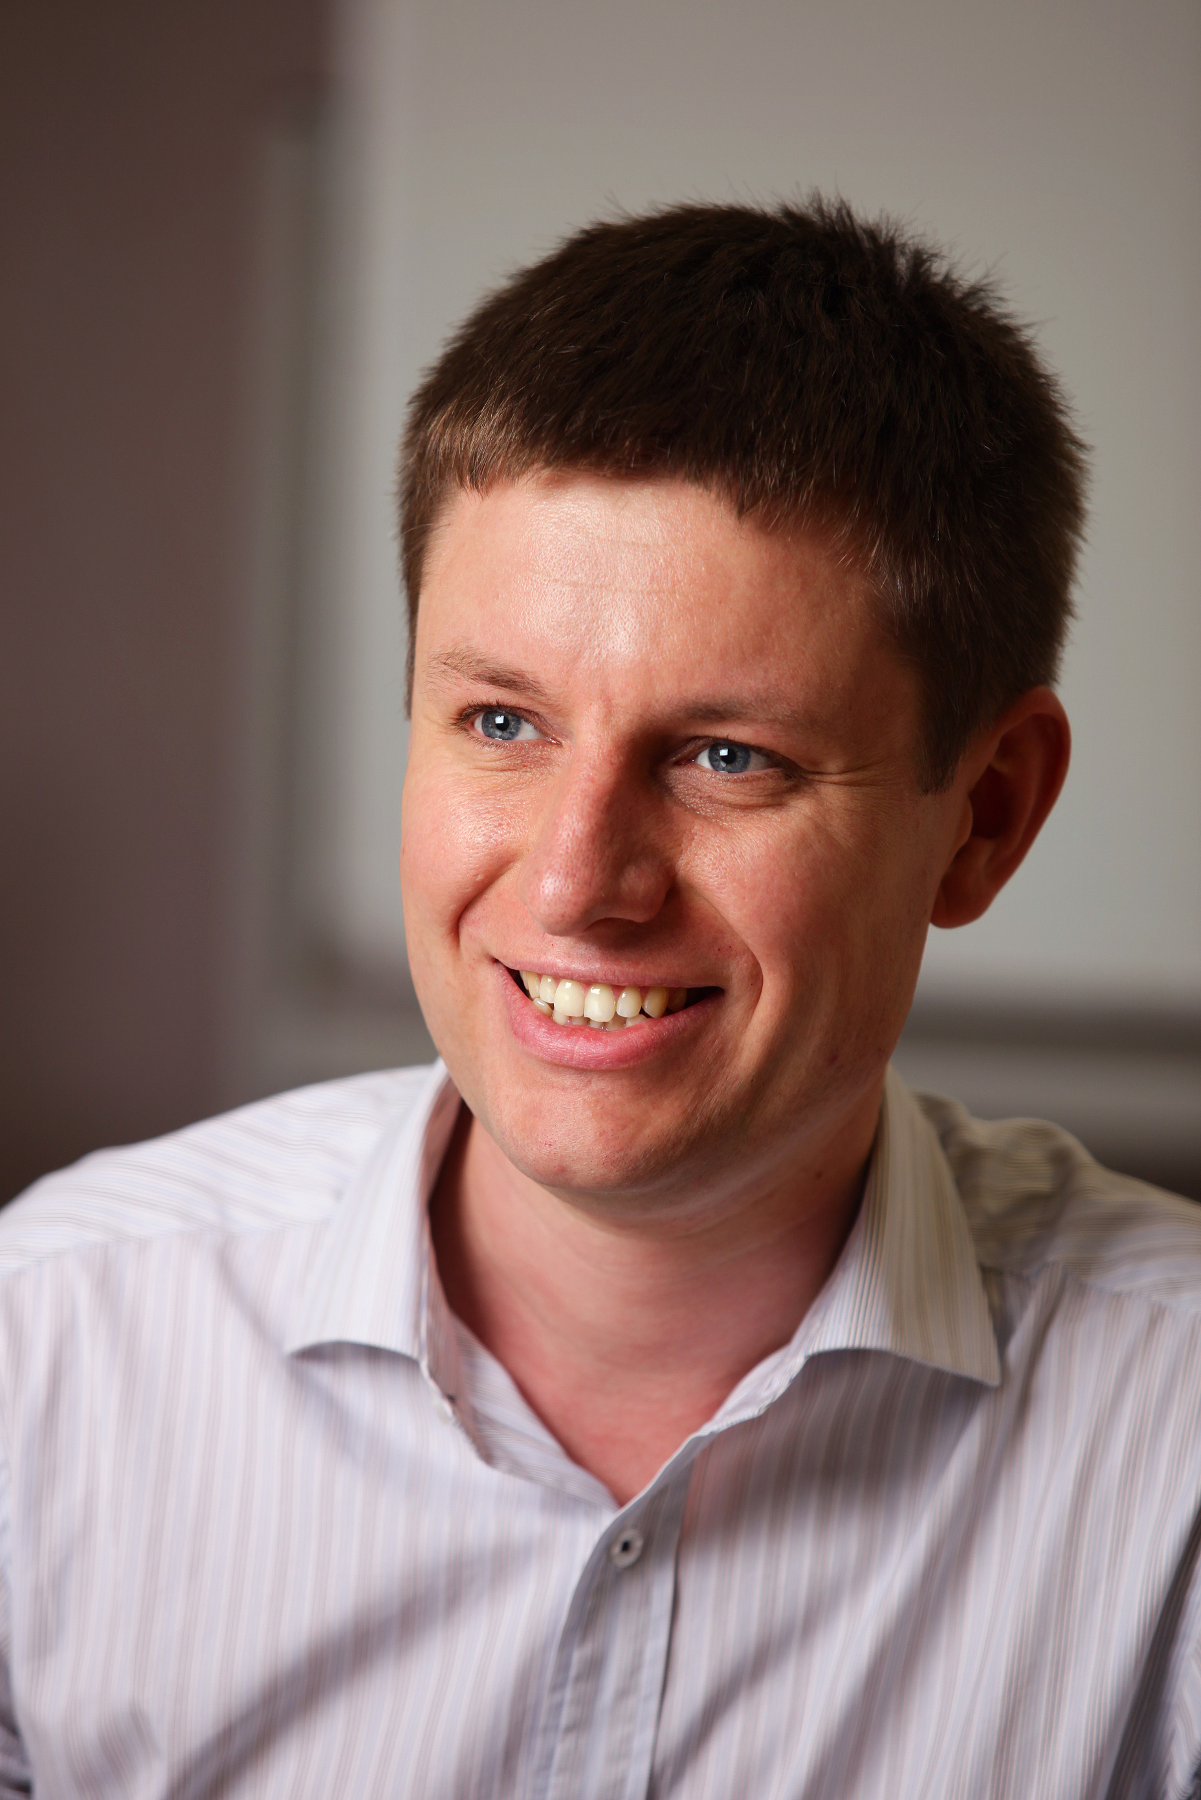 Profile picture of Paul Fawcett